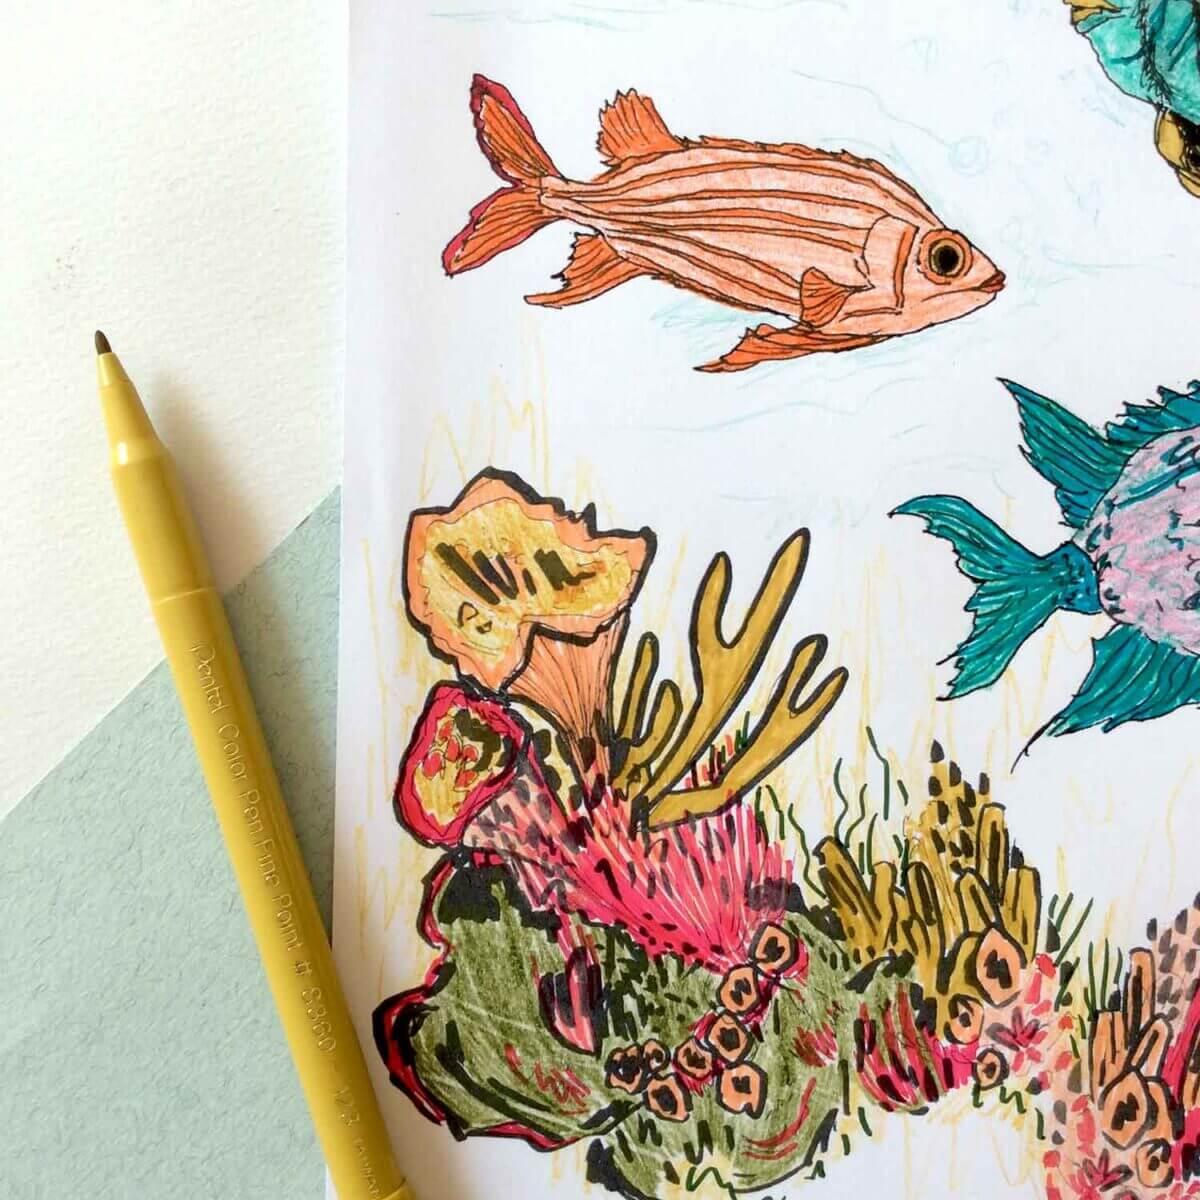 Under-The-Sea-Colouring-Sheet-Orange-Fish-Sky-Siouki